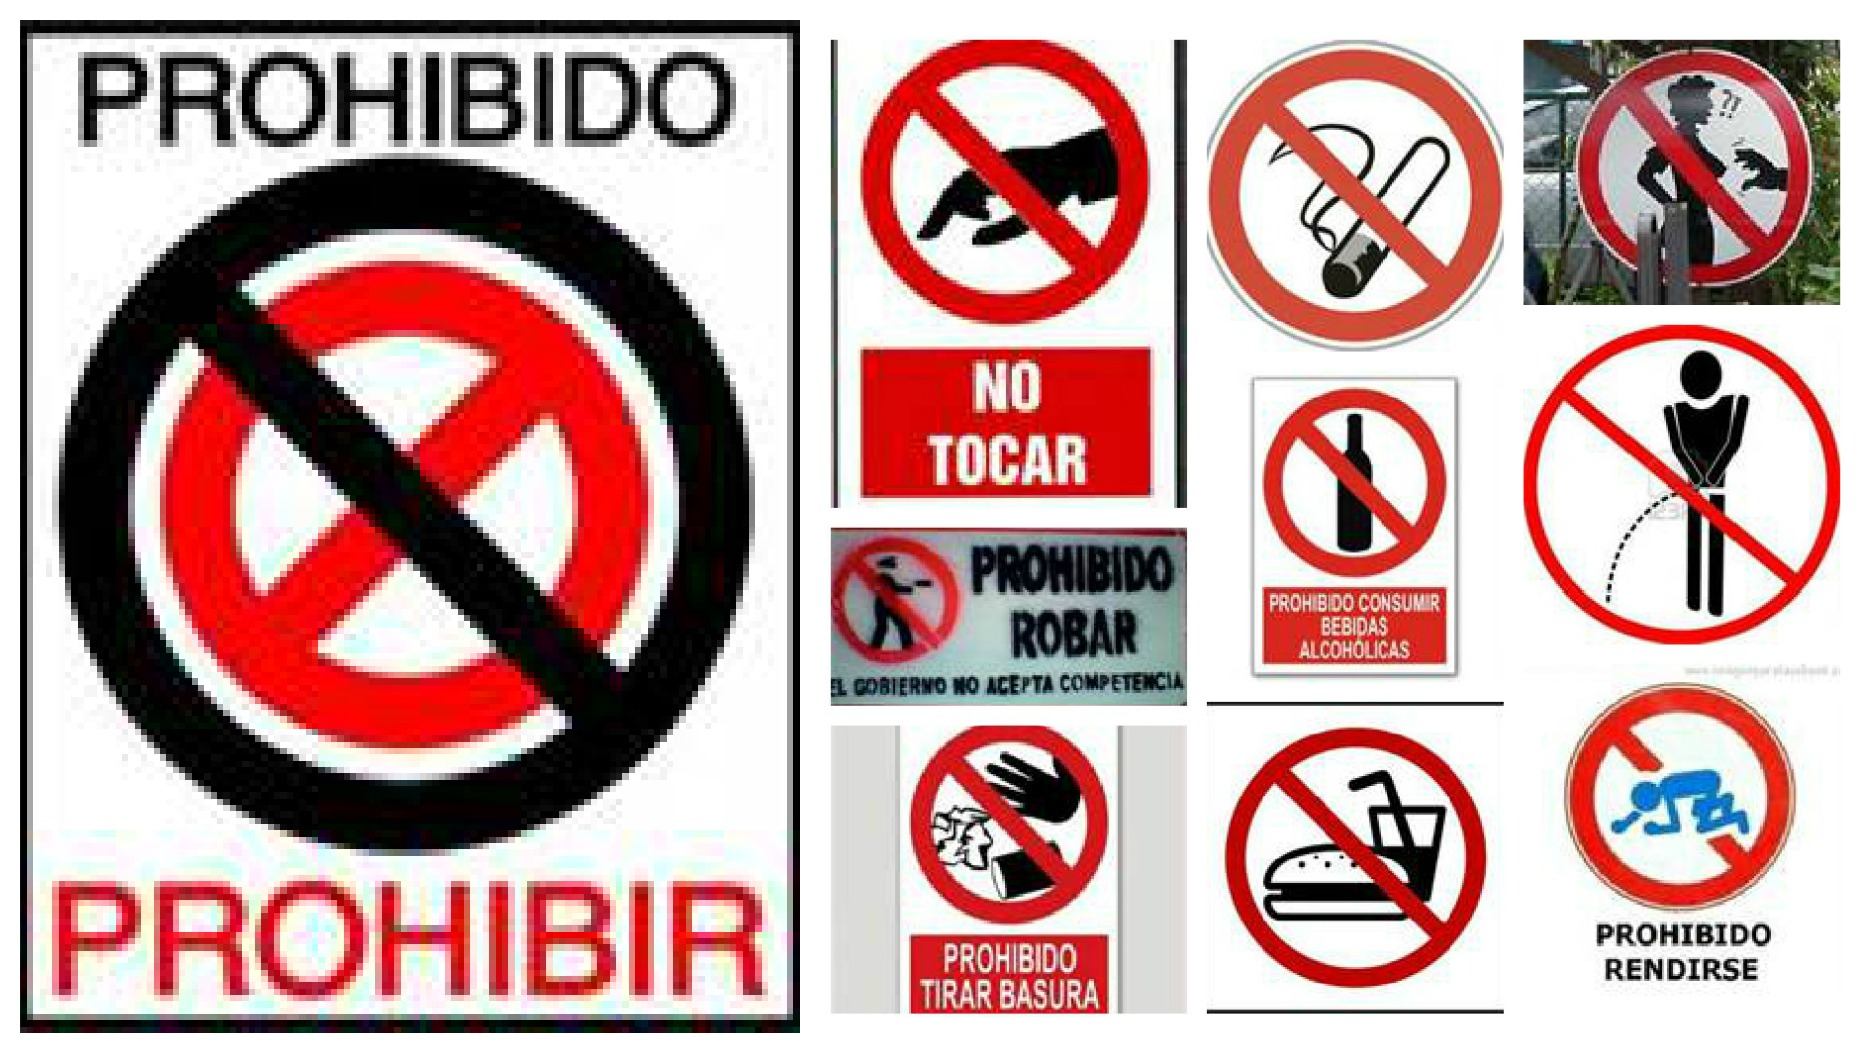 Prohibido prohibir en Nochebuena | Diario informal